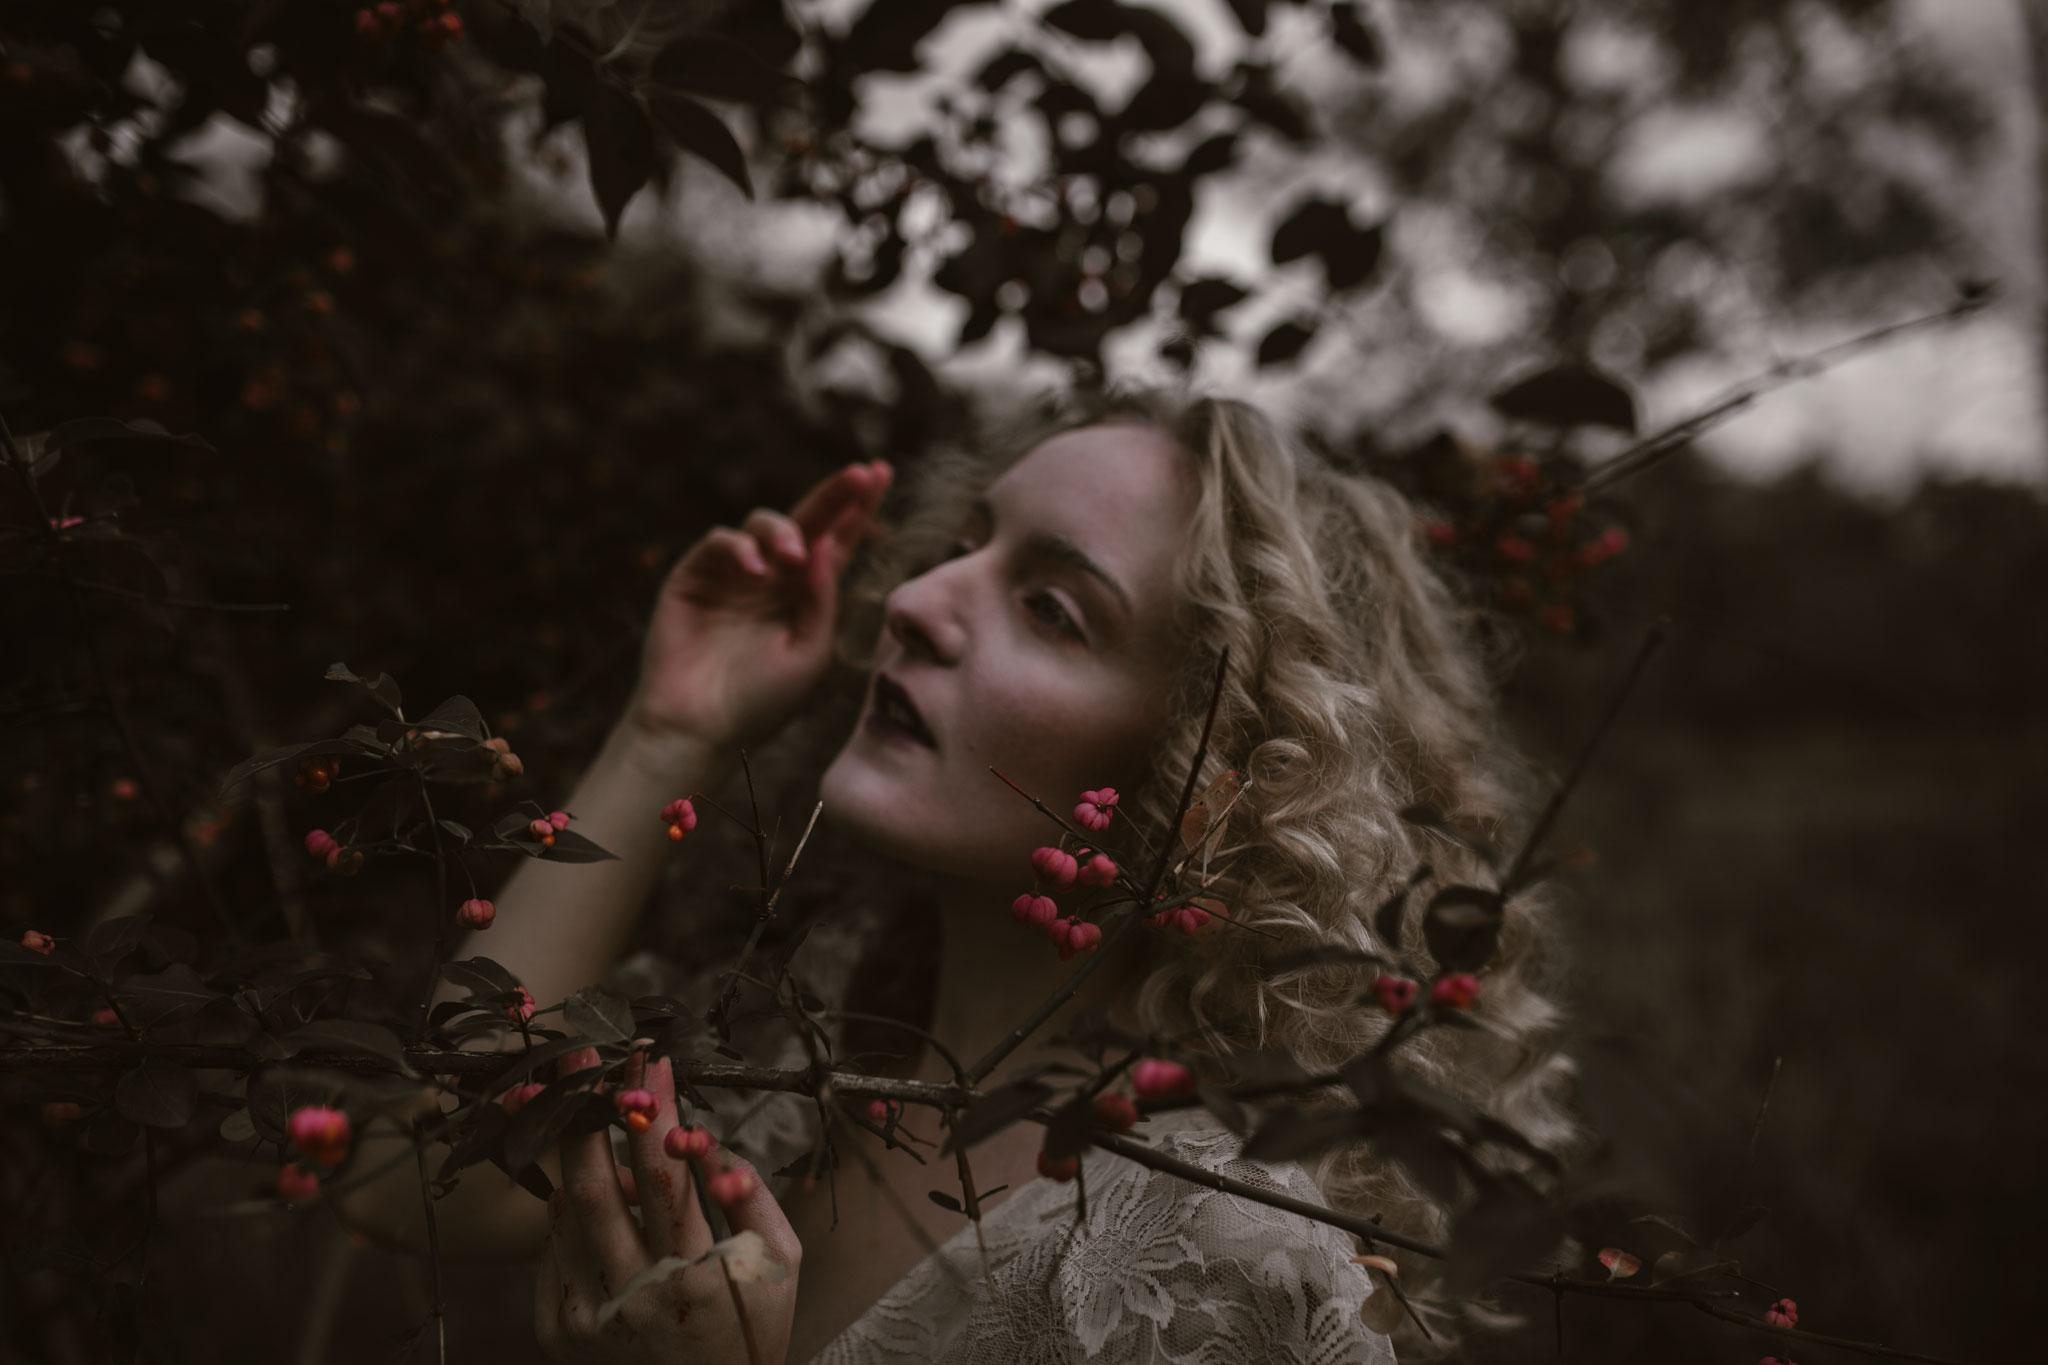 pale-witch-169fb.jpg